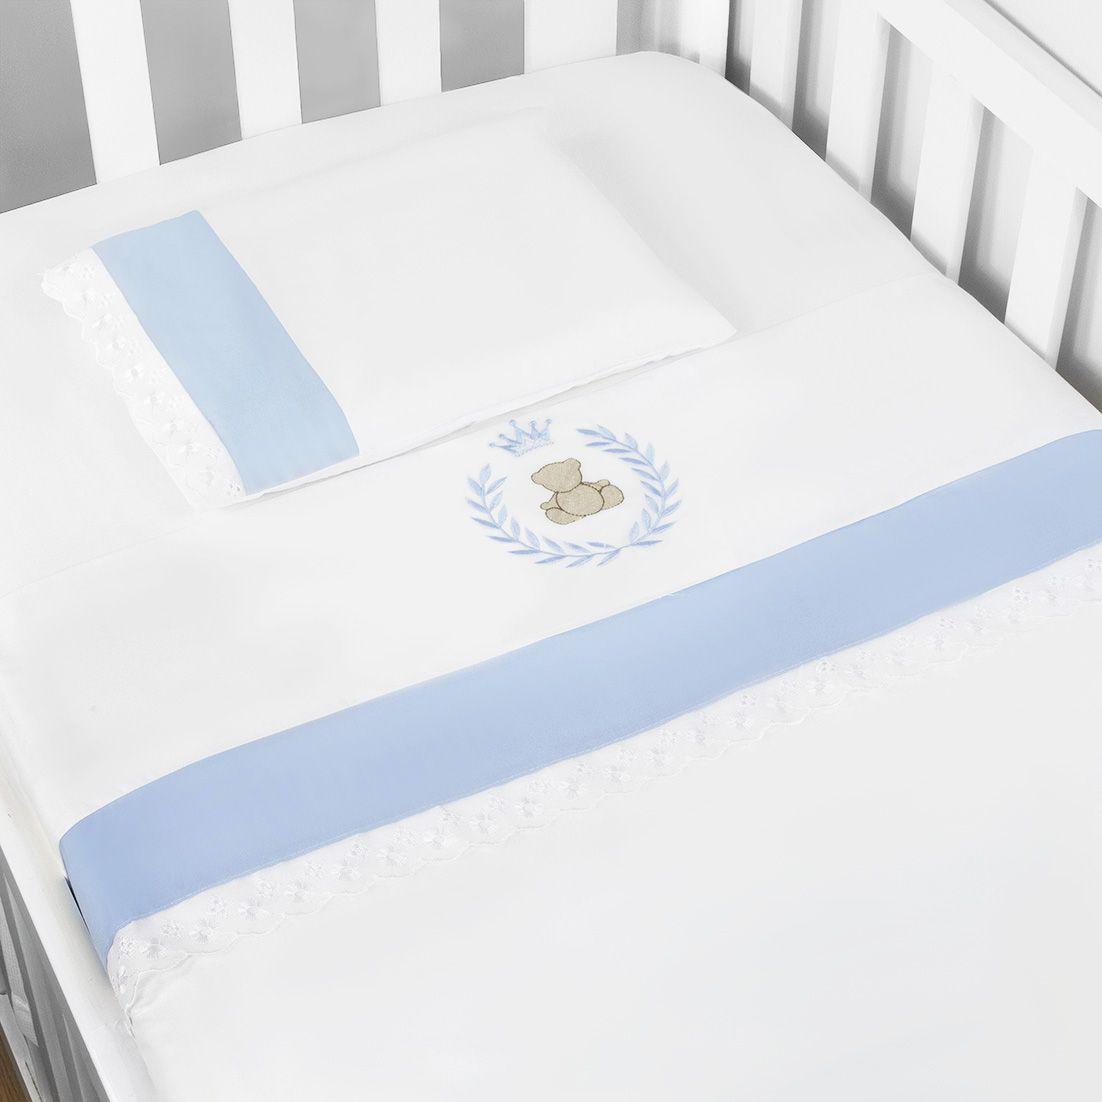 Jg. de Lençol Americ. 03 Pçs - Thed. Azul